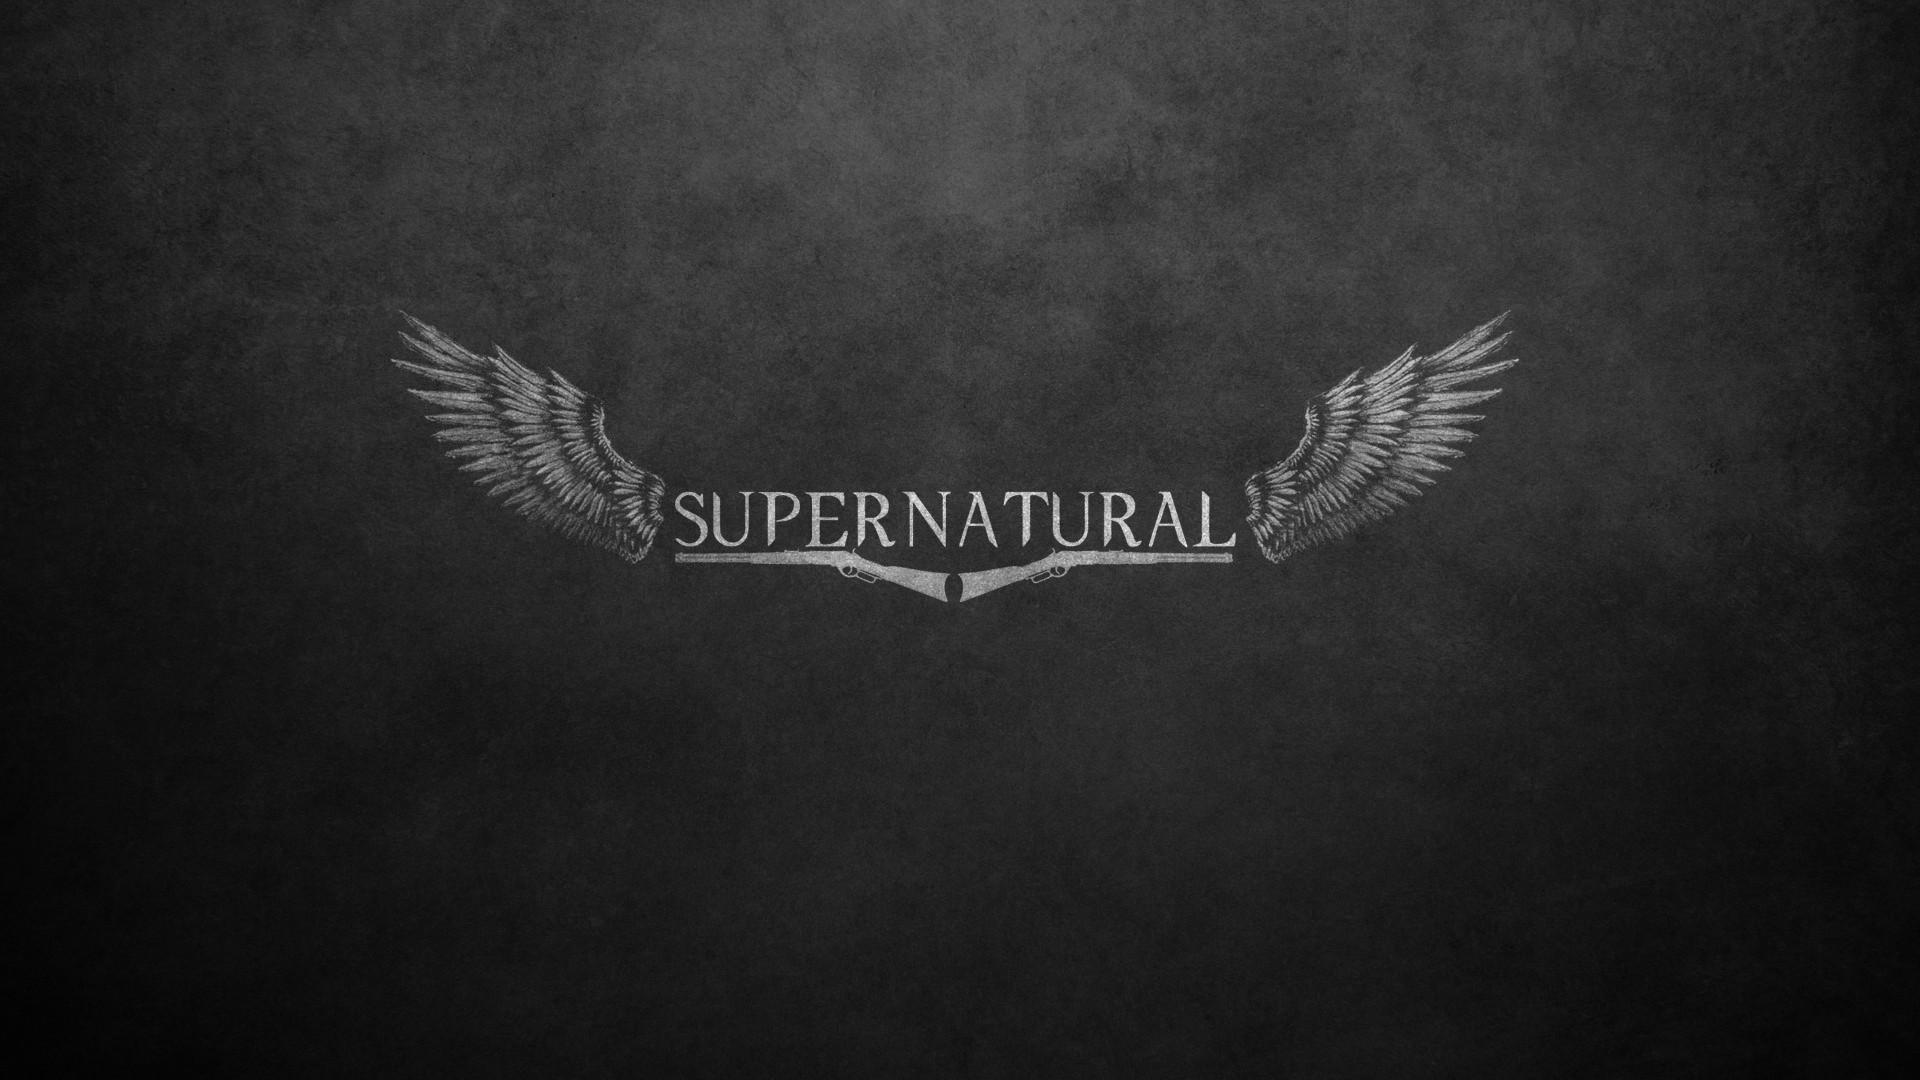 Logo Supernatural Wallpaper Wallpapers Backgrounds Images Art 4k Supernatural Wallpaper Supernatural Twitter Supernatural Background